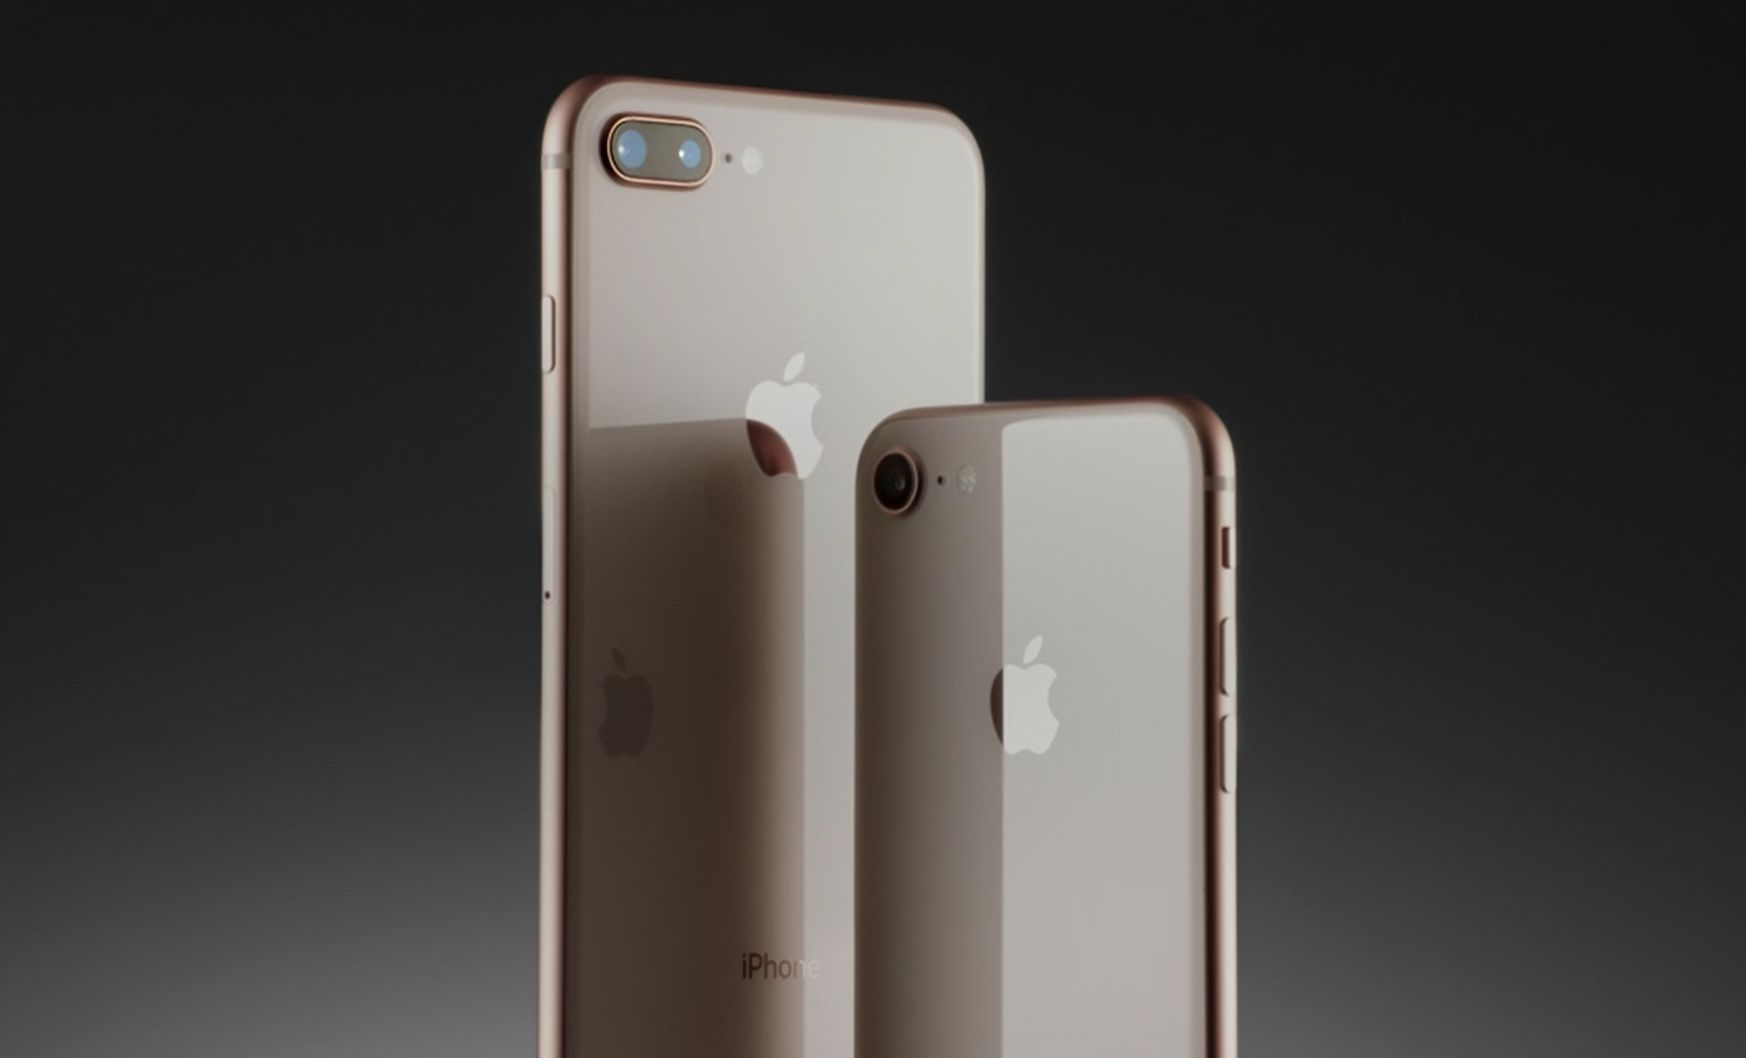 iphone 8 plus cena w polsce